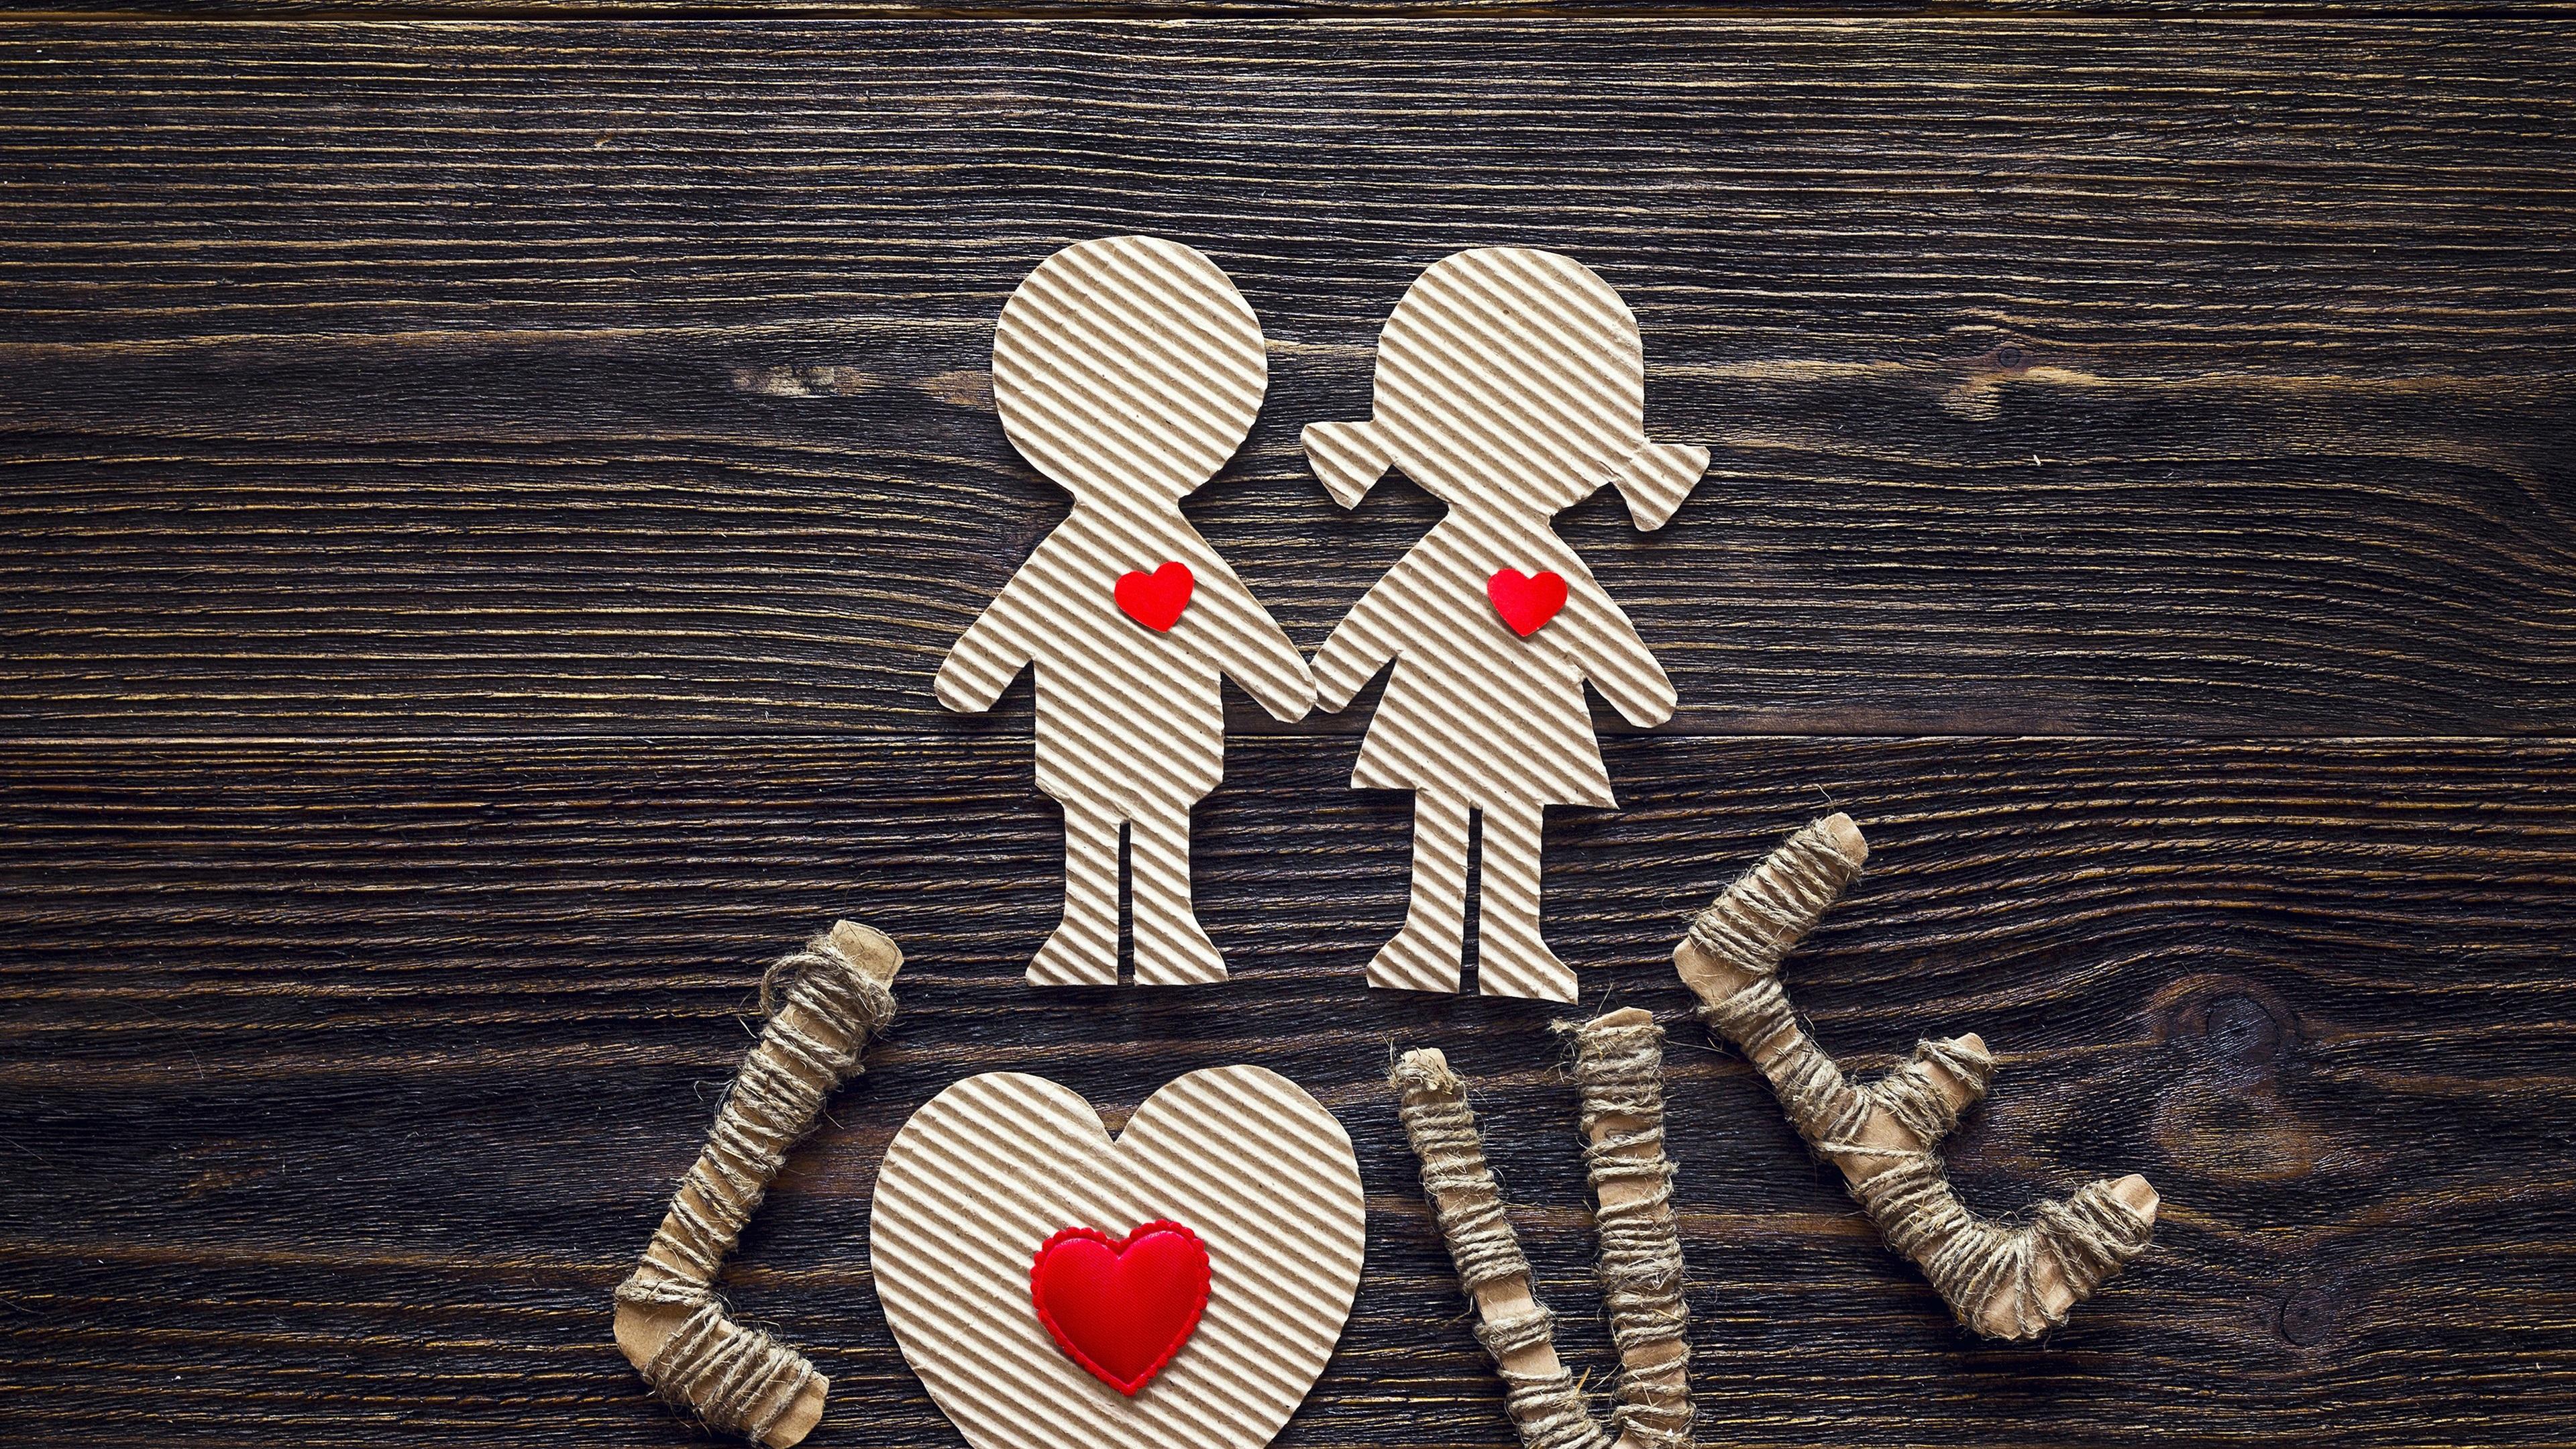 Wallpaper Love Girl And Boy Paper Art 3840x2160 Uhd 4k